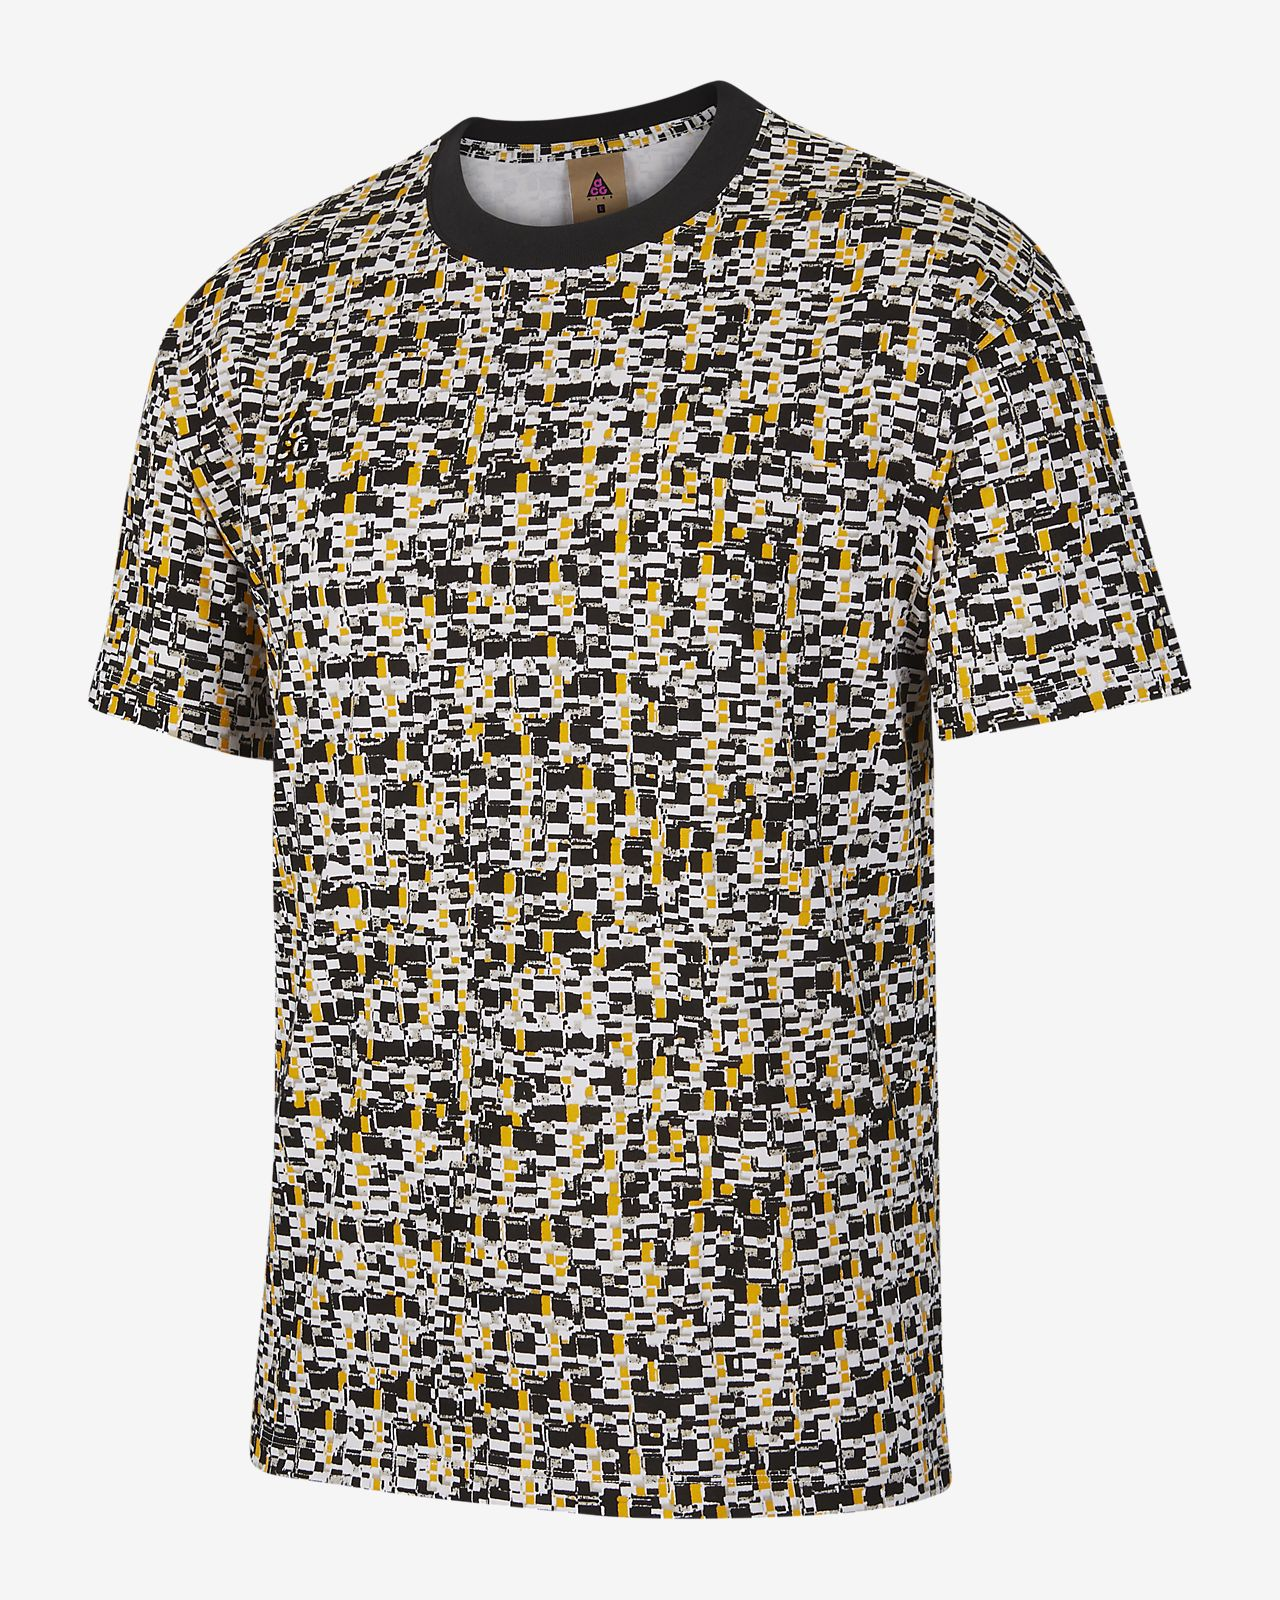 Nike ACG Men's Printed Short-Sleeve T-Shirt